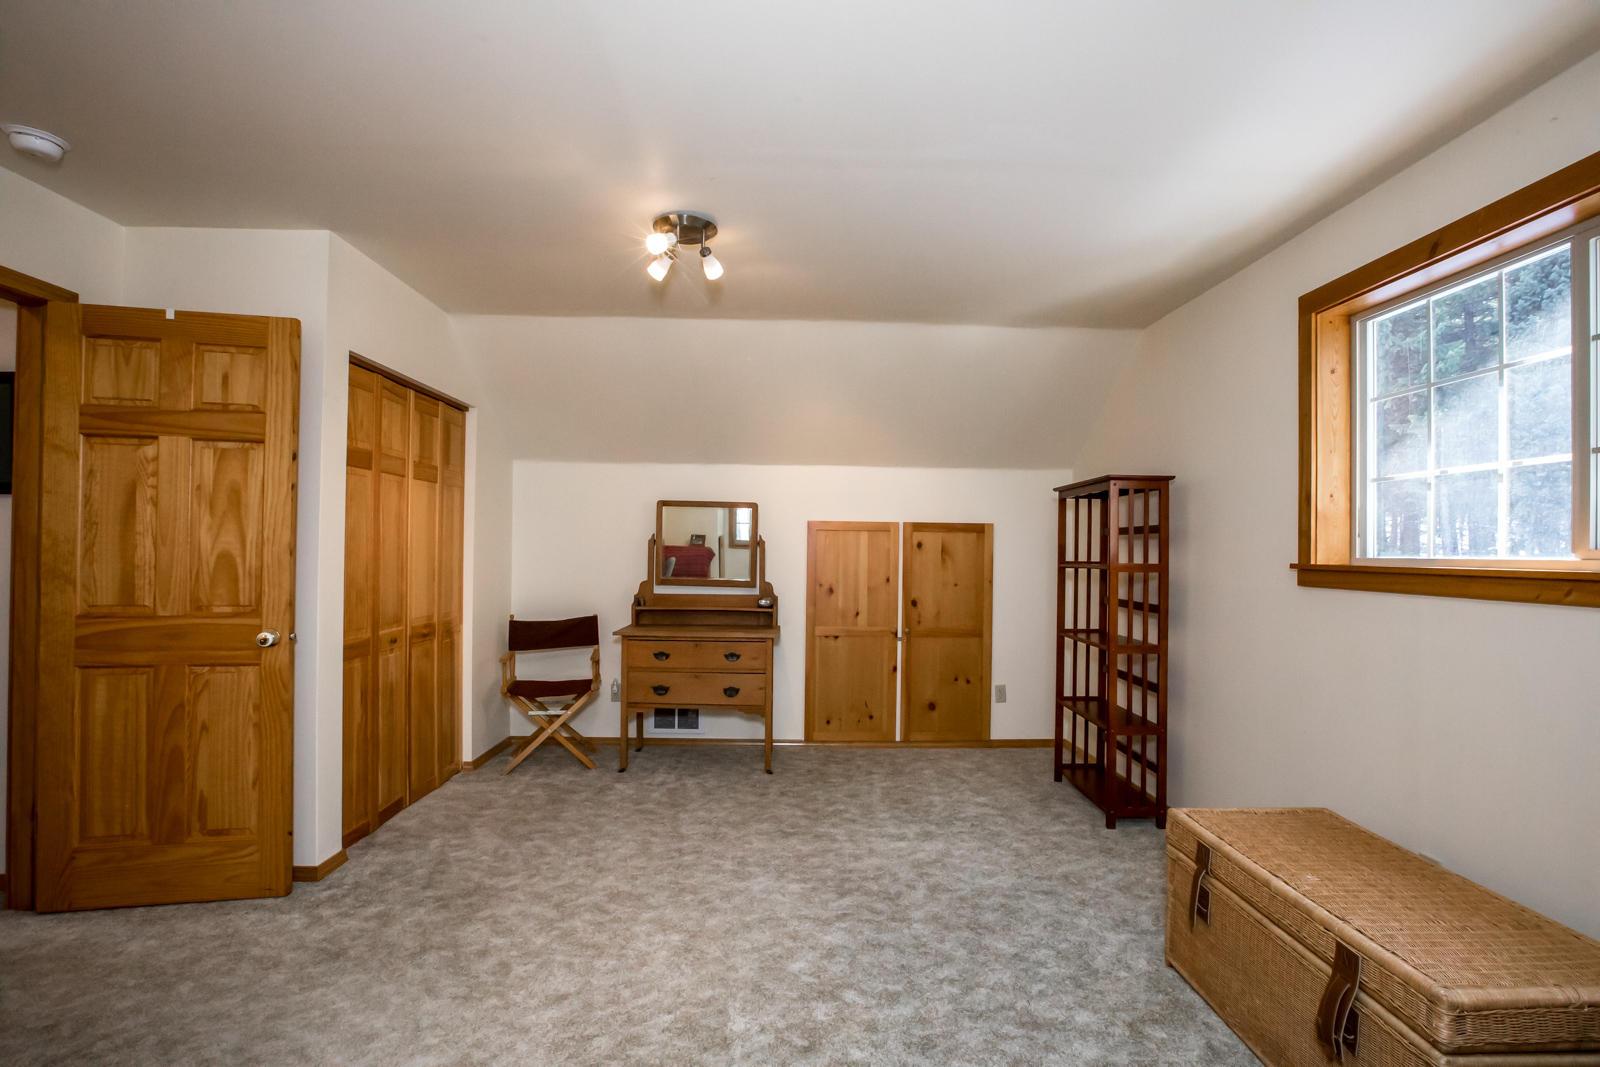 More bonus space and storage